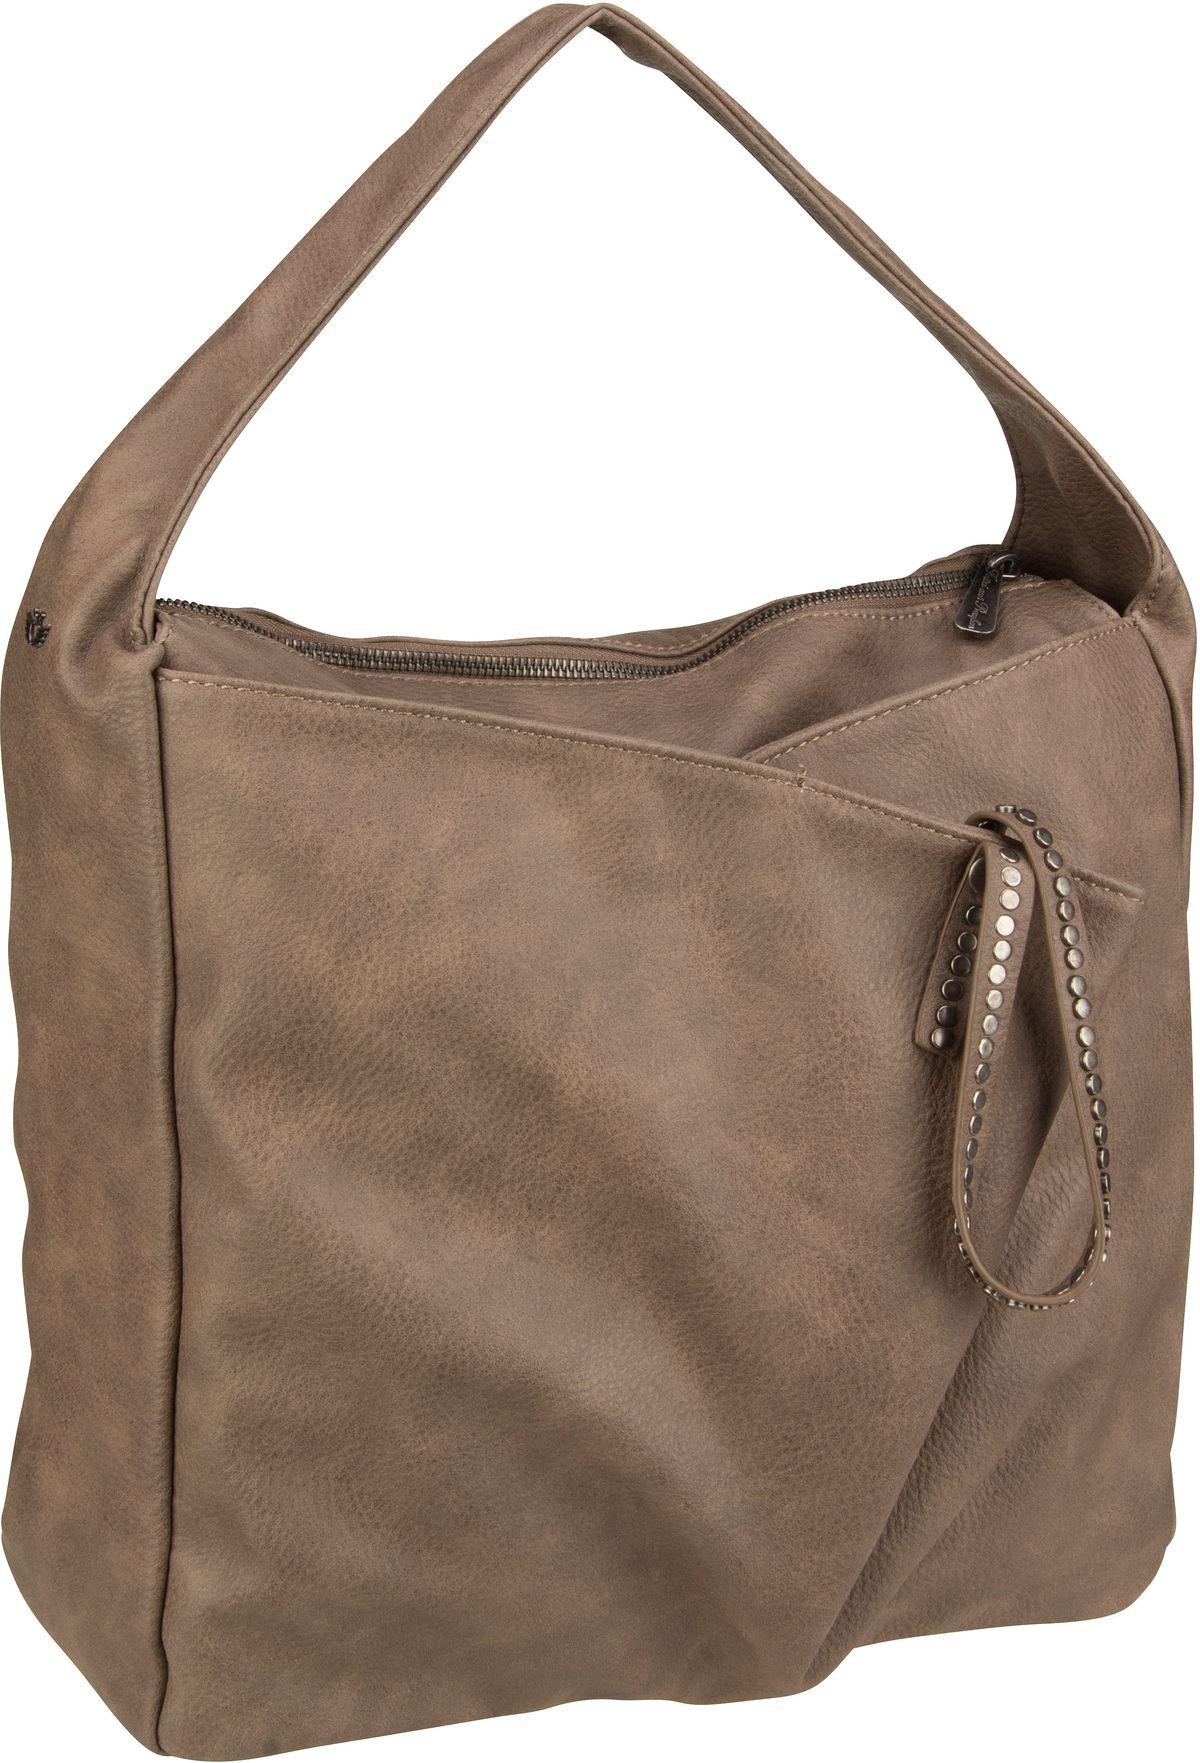 Handtasche Nala Caribou Mud